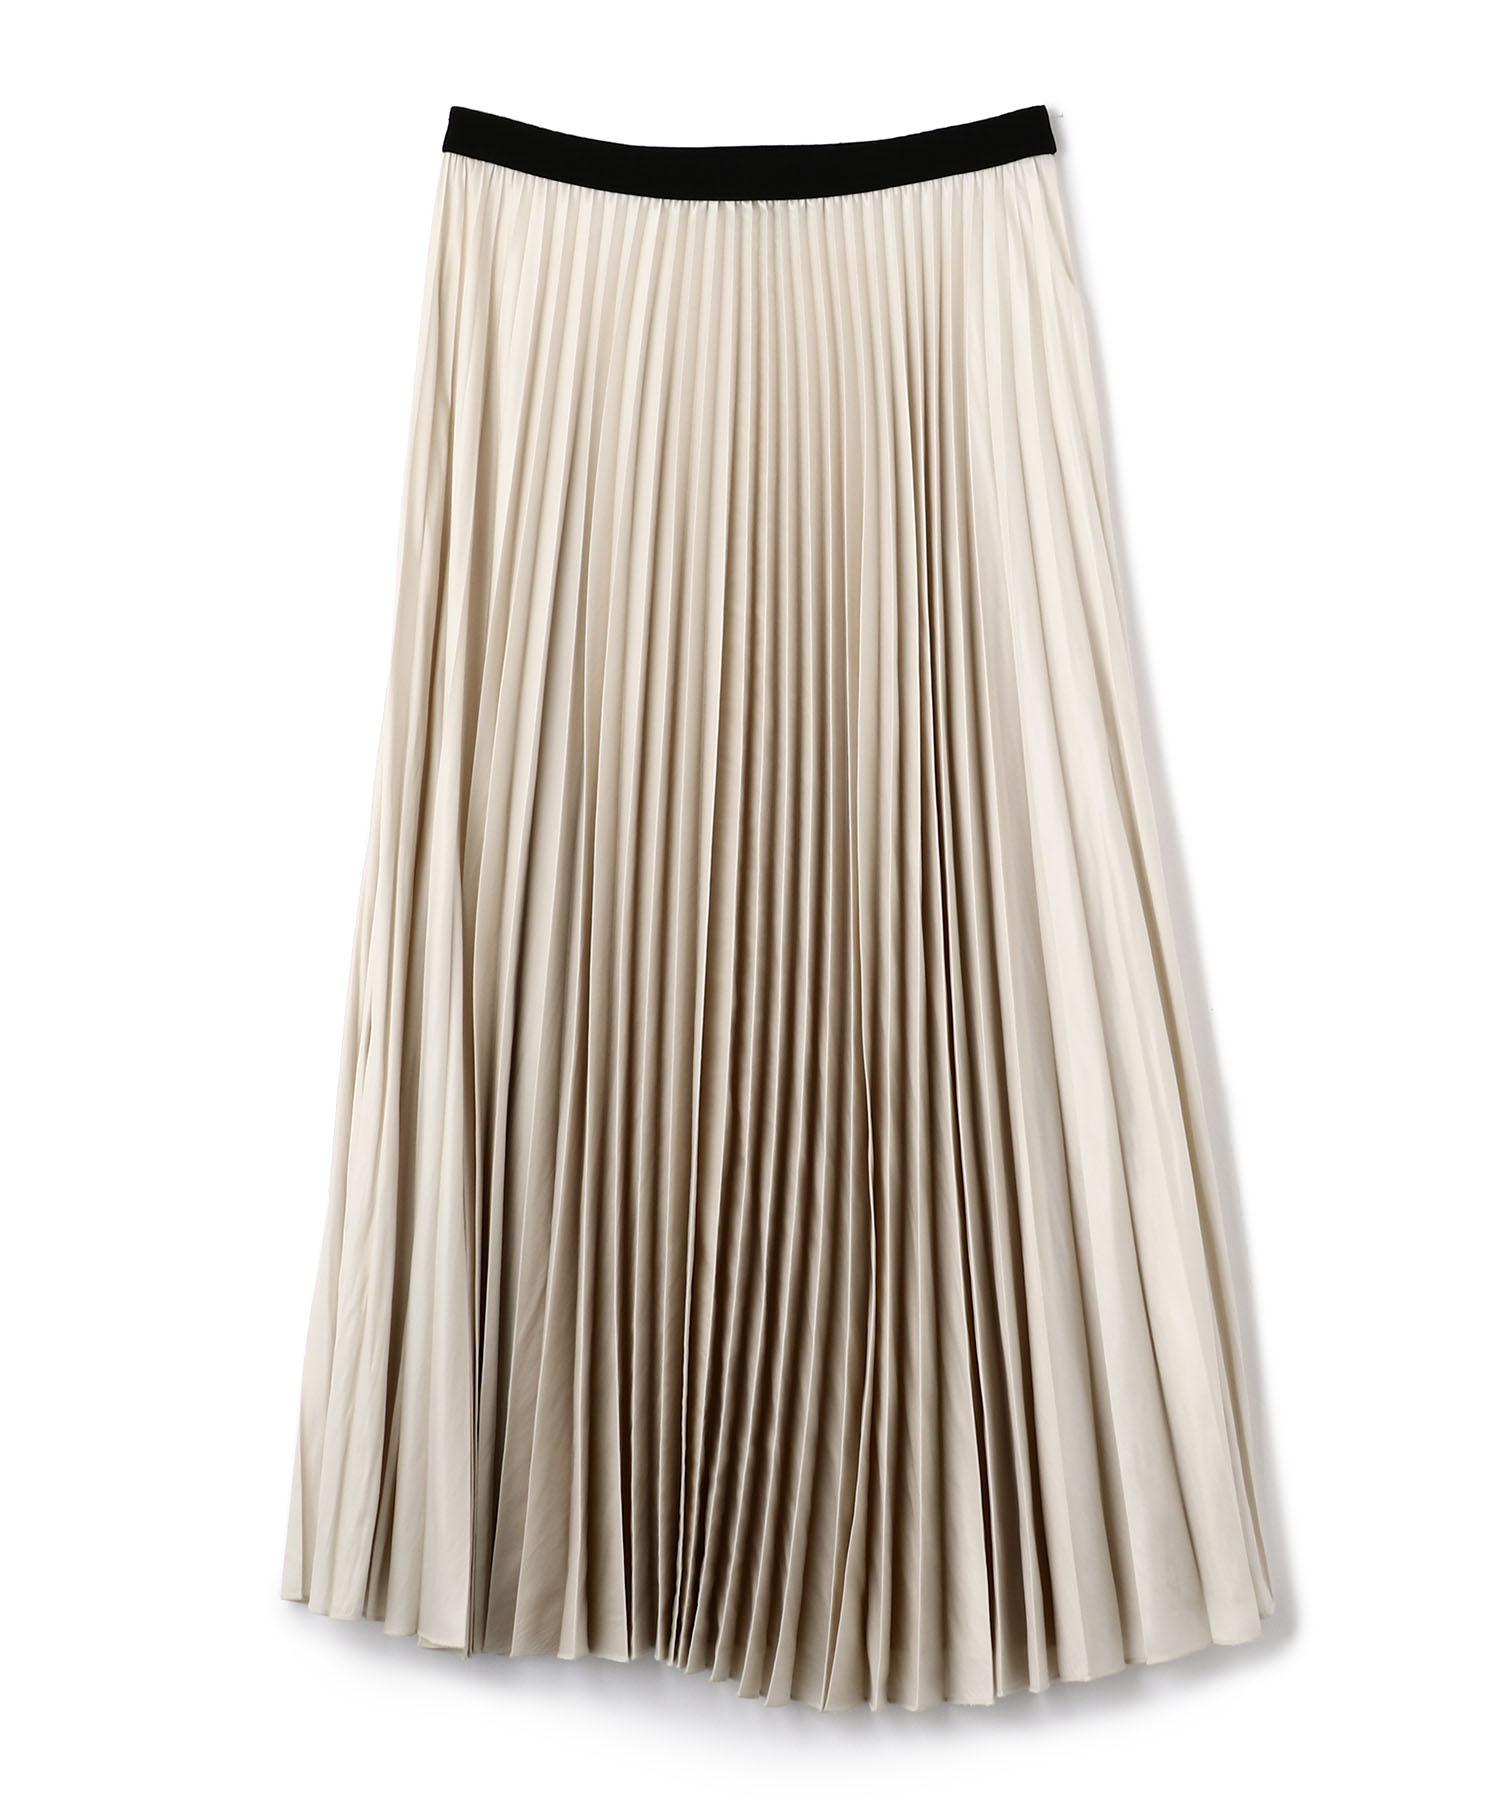 Accordion Pleats Skirt